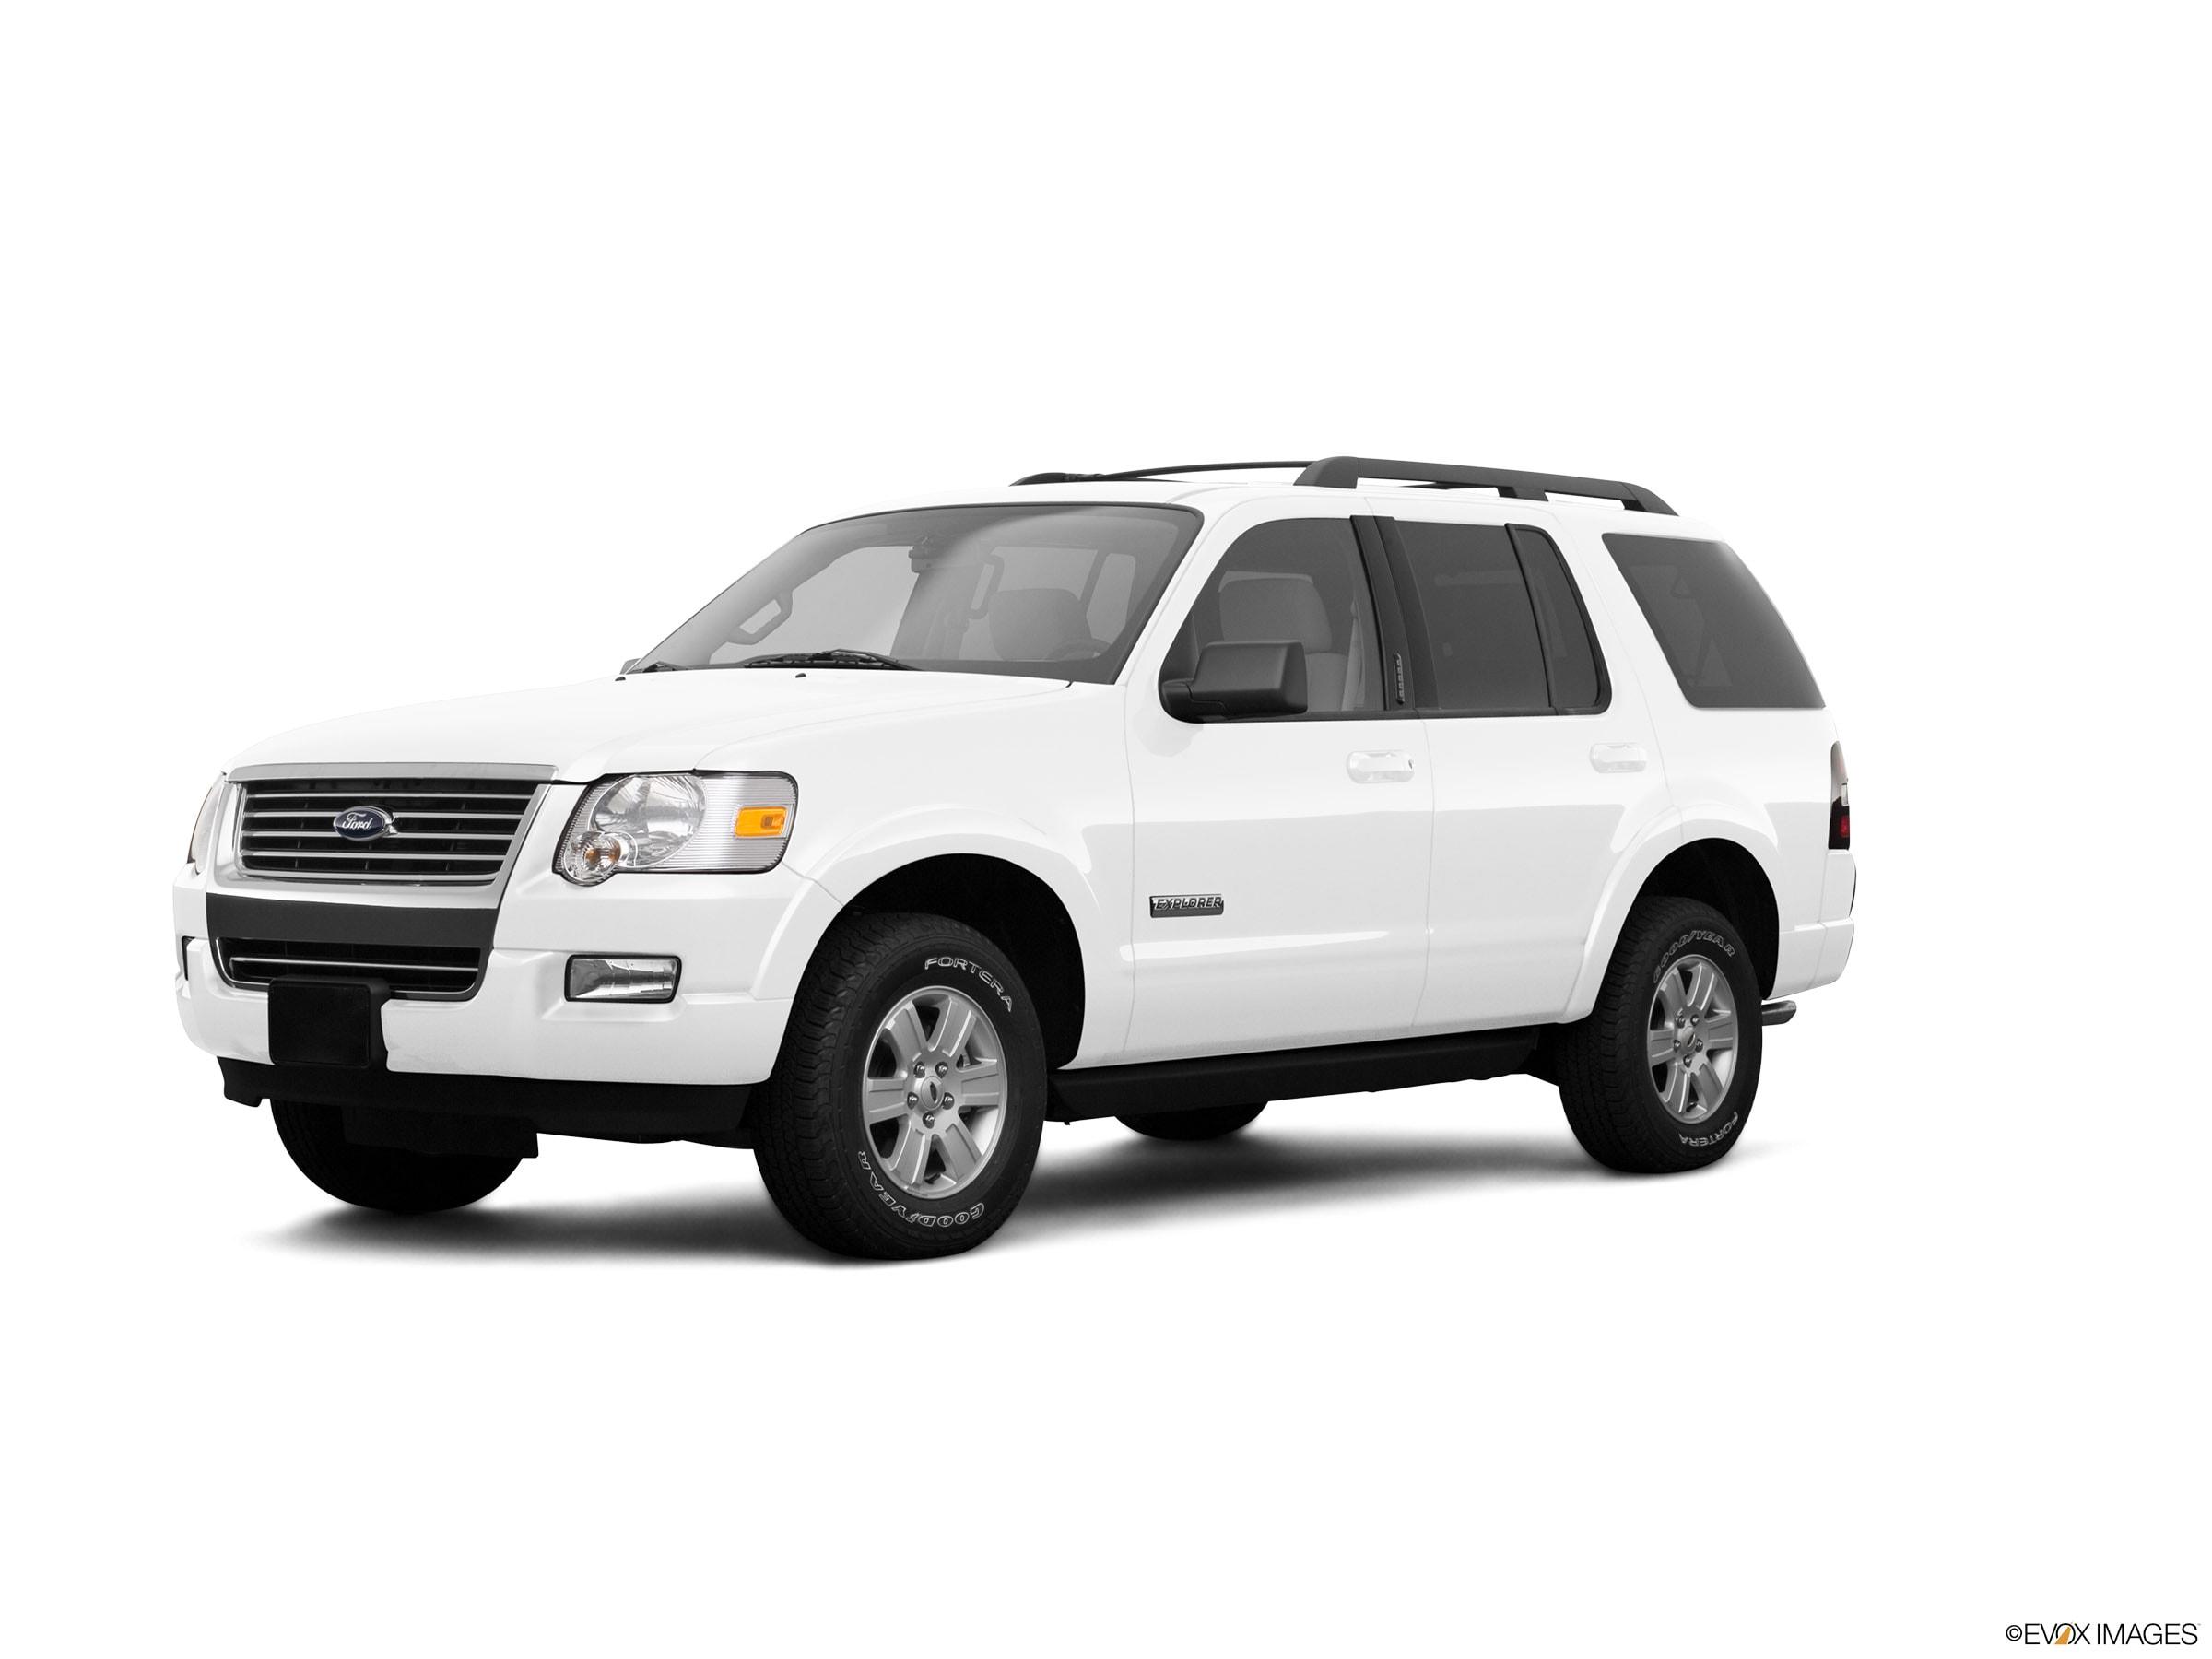 2008 Ford Explorer XLT SUV